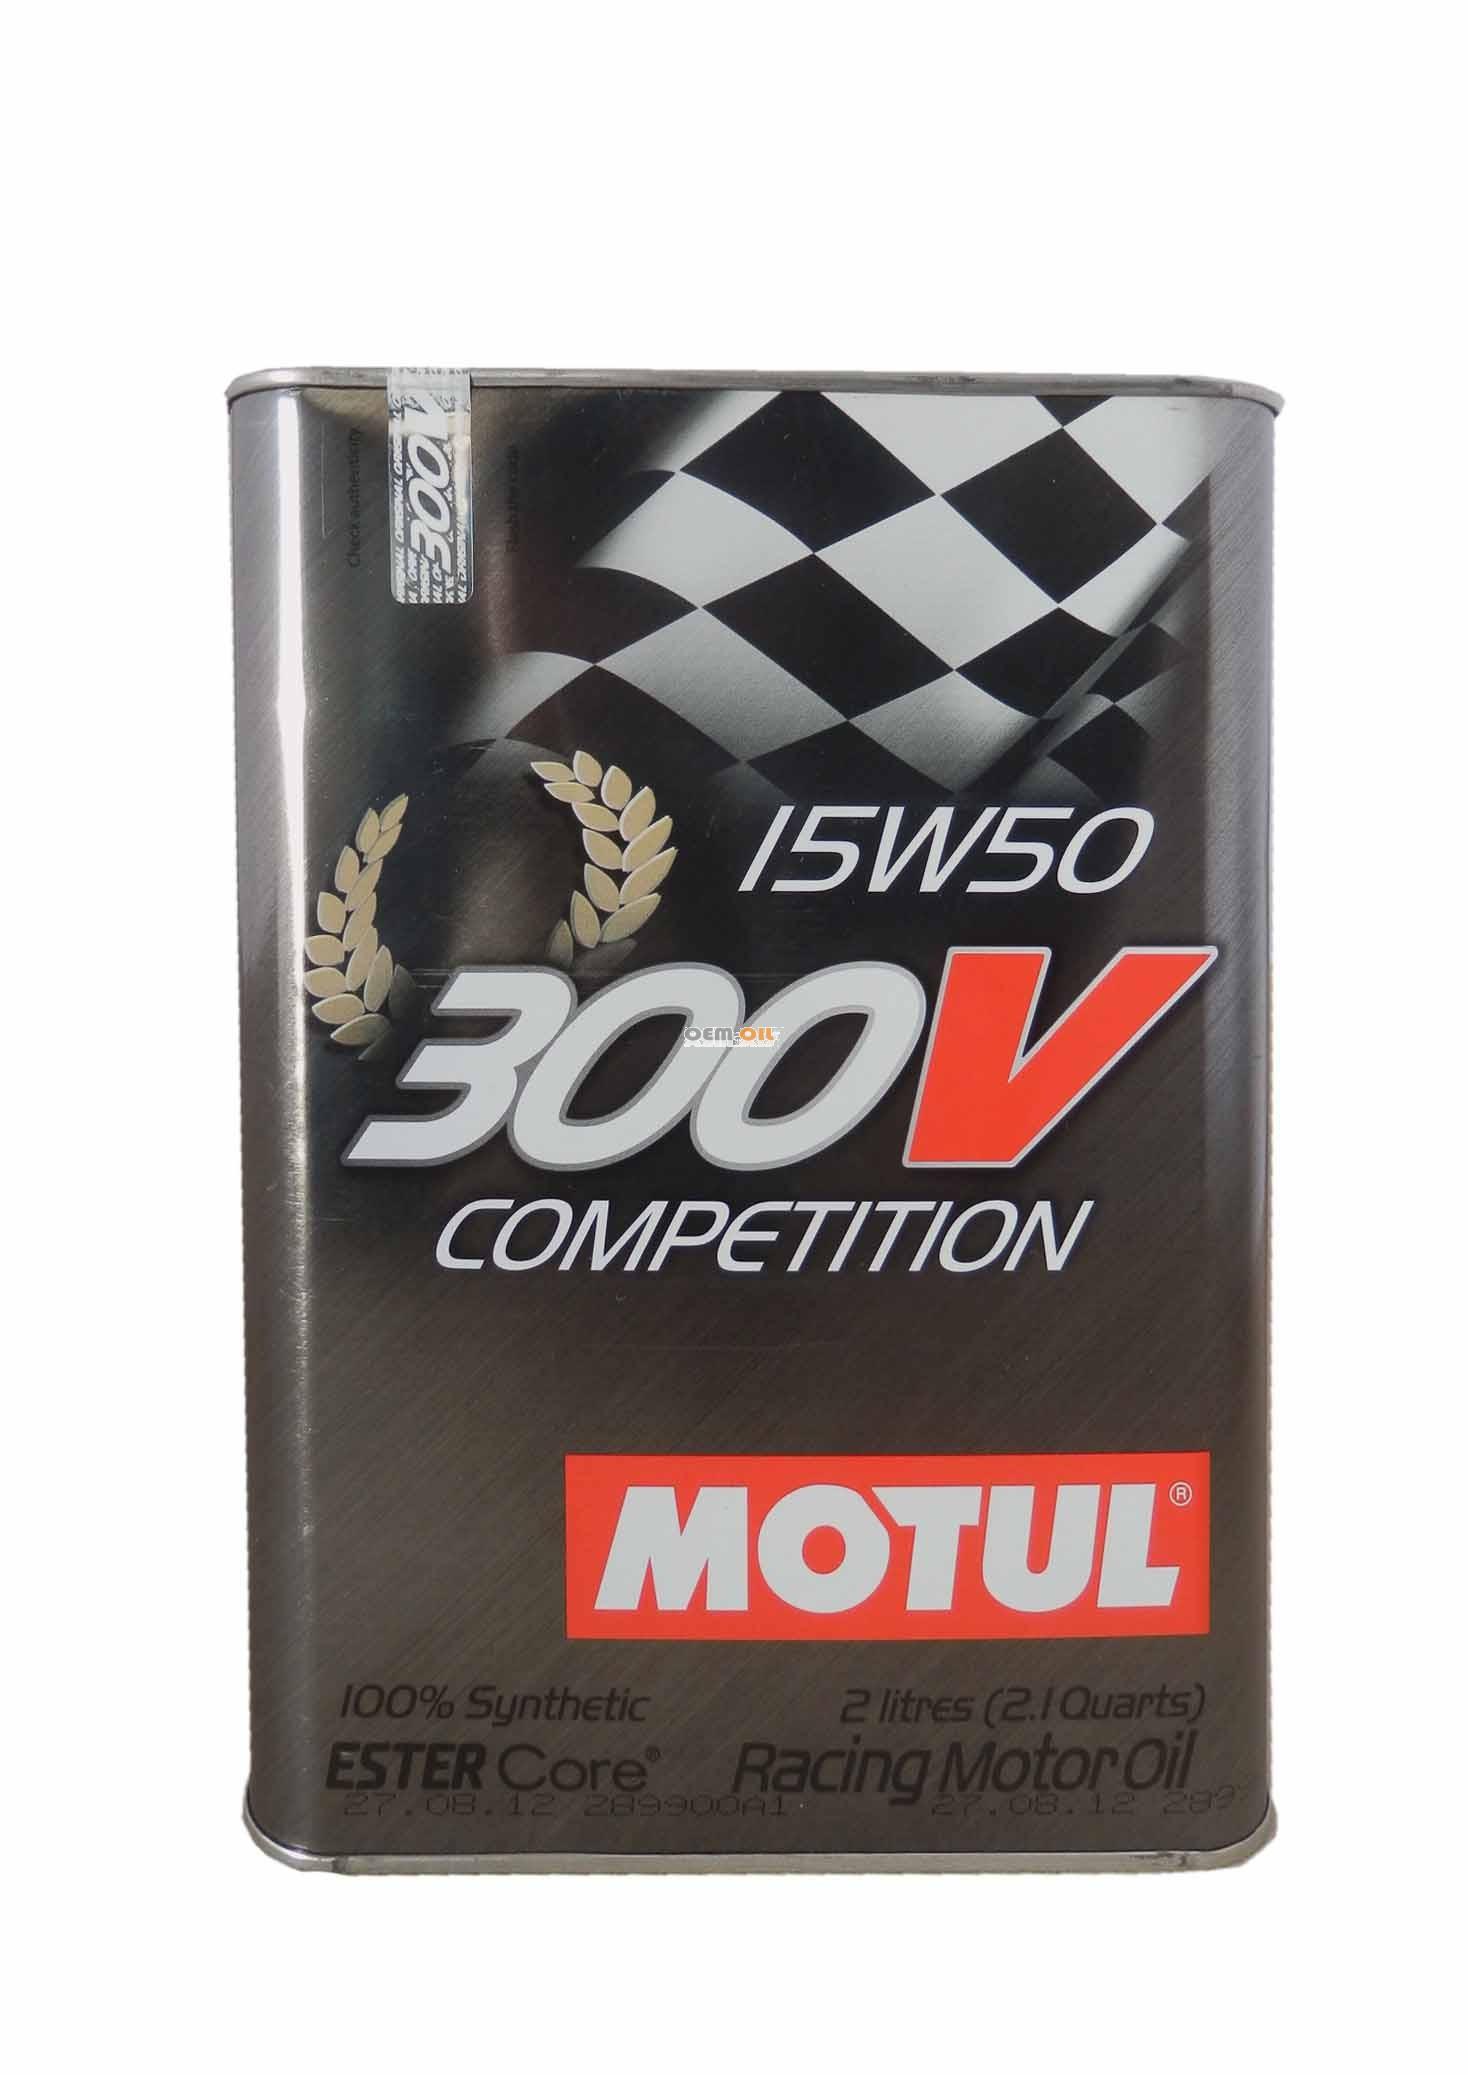 300V COMPETITION Motul 103138